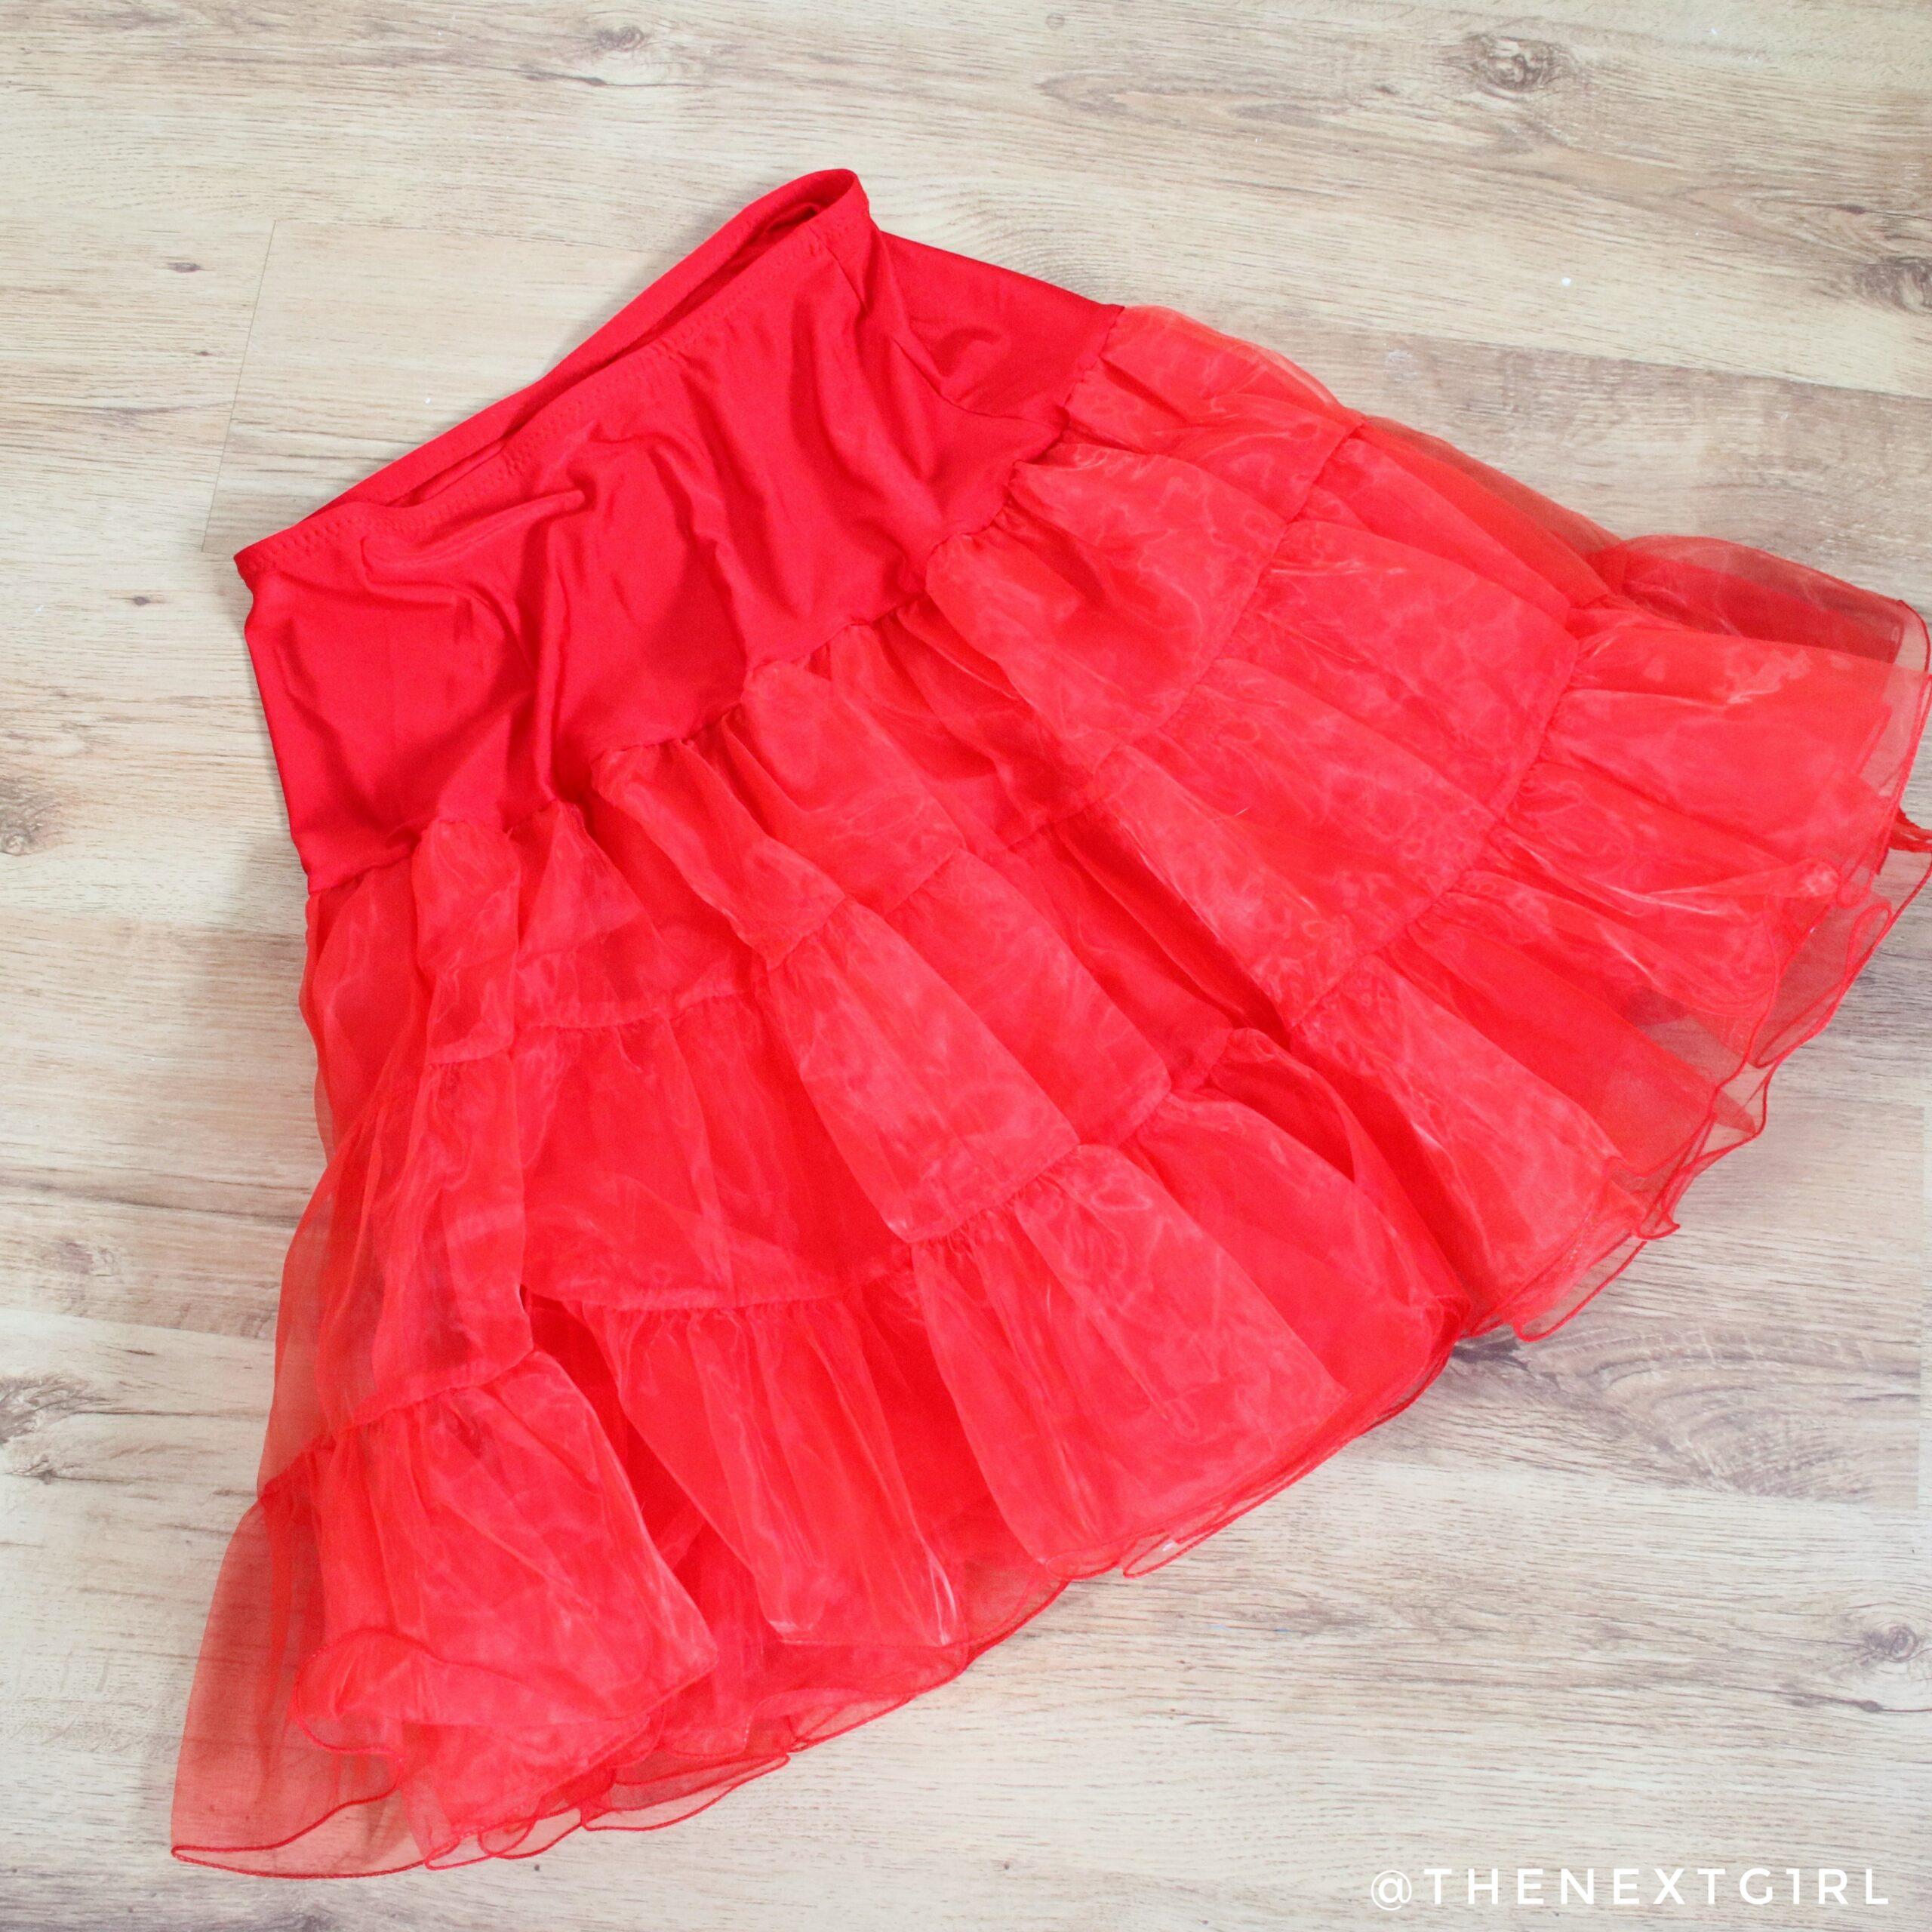 Rode petticoat onderrok